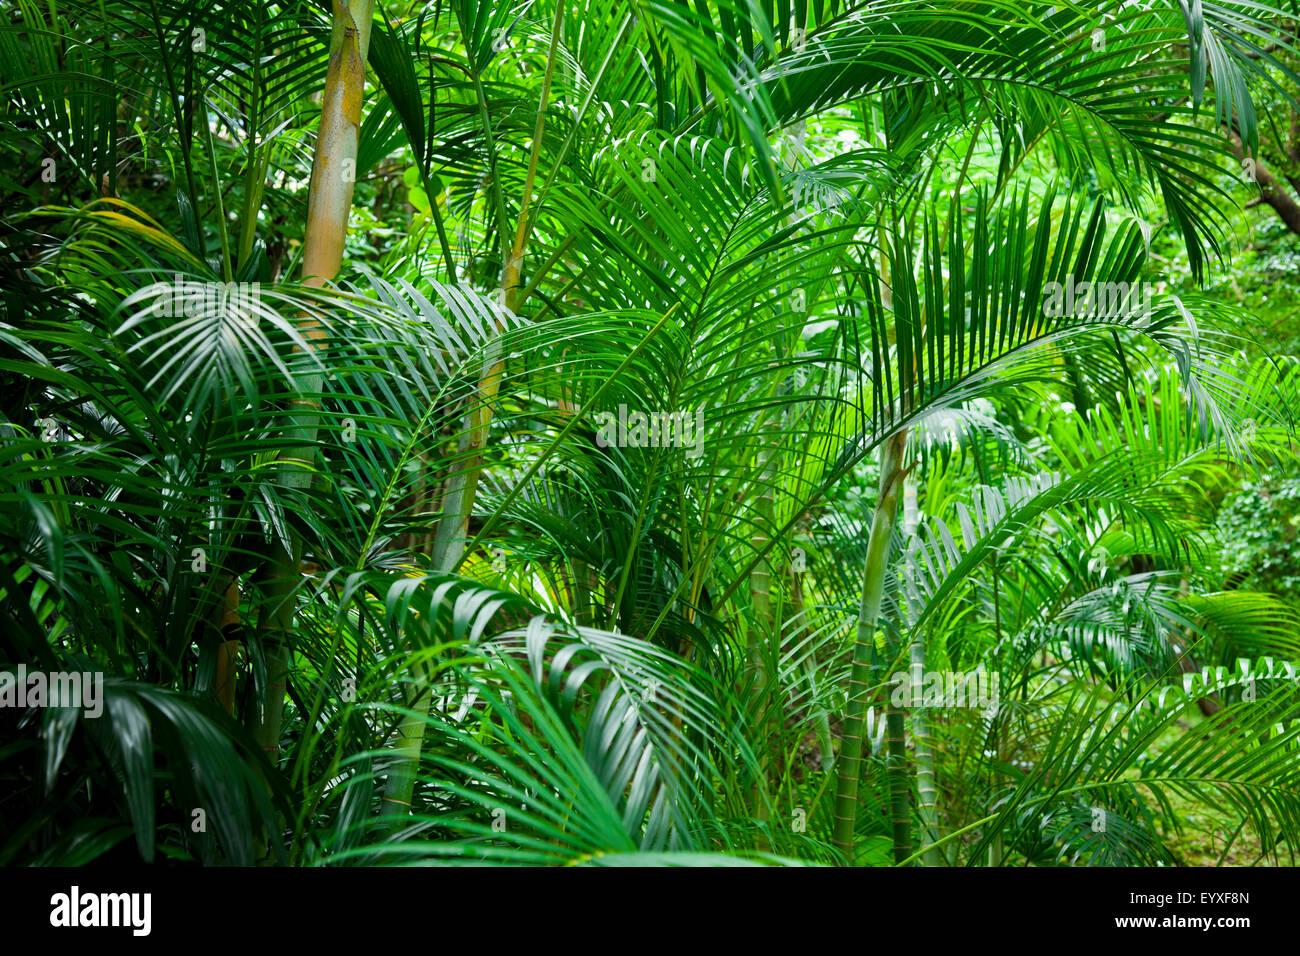 Tropical lush green palm tree jungle background Stock ...